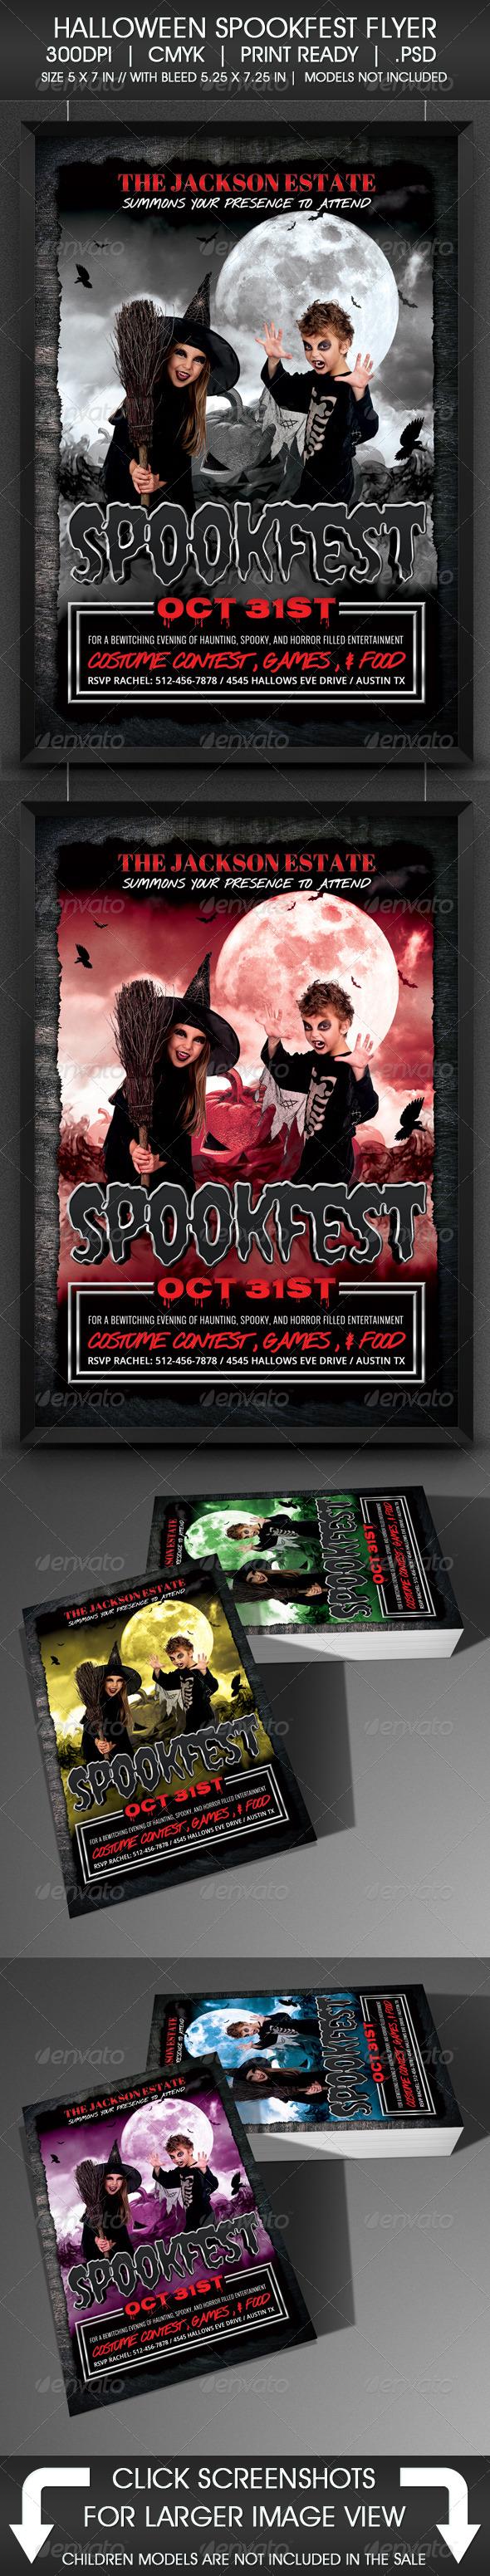 GraphicRiver Halloween Spookfest Flyer 5526019